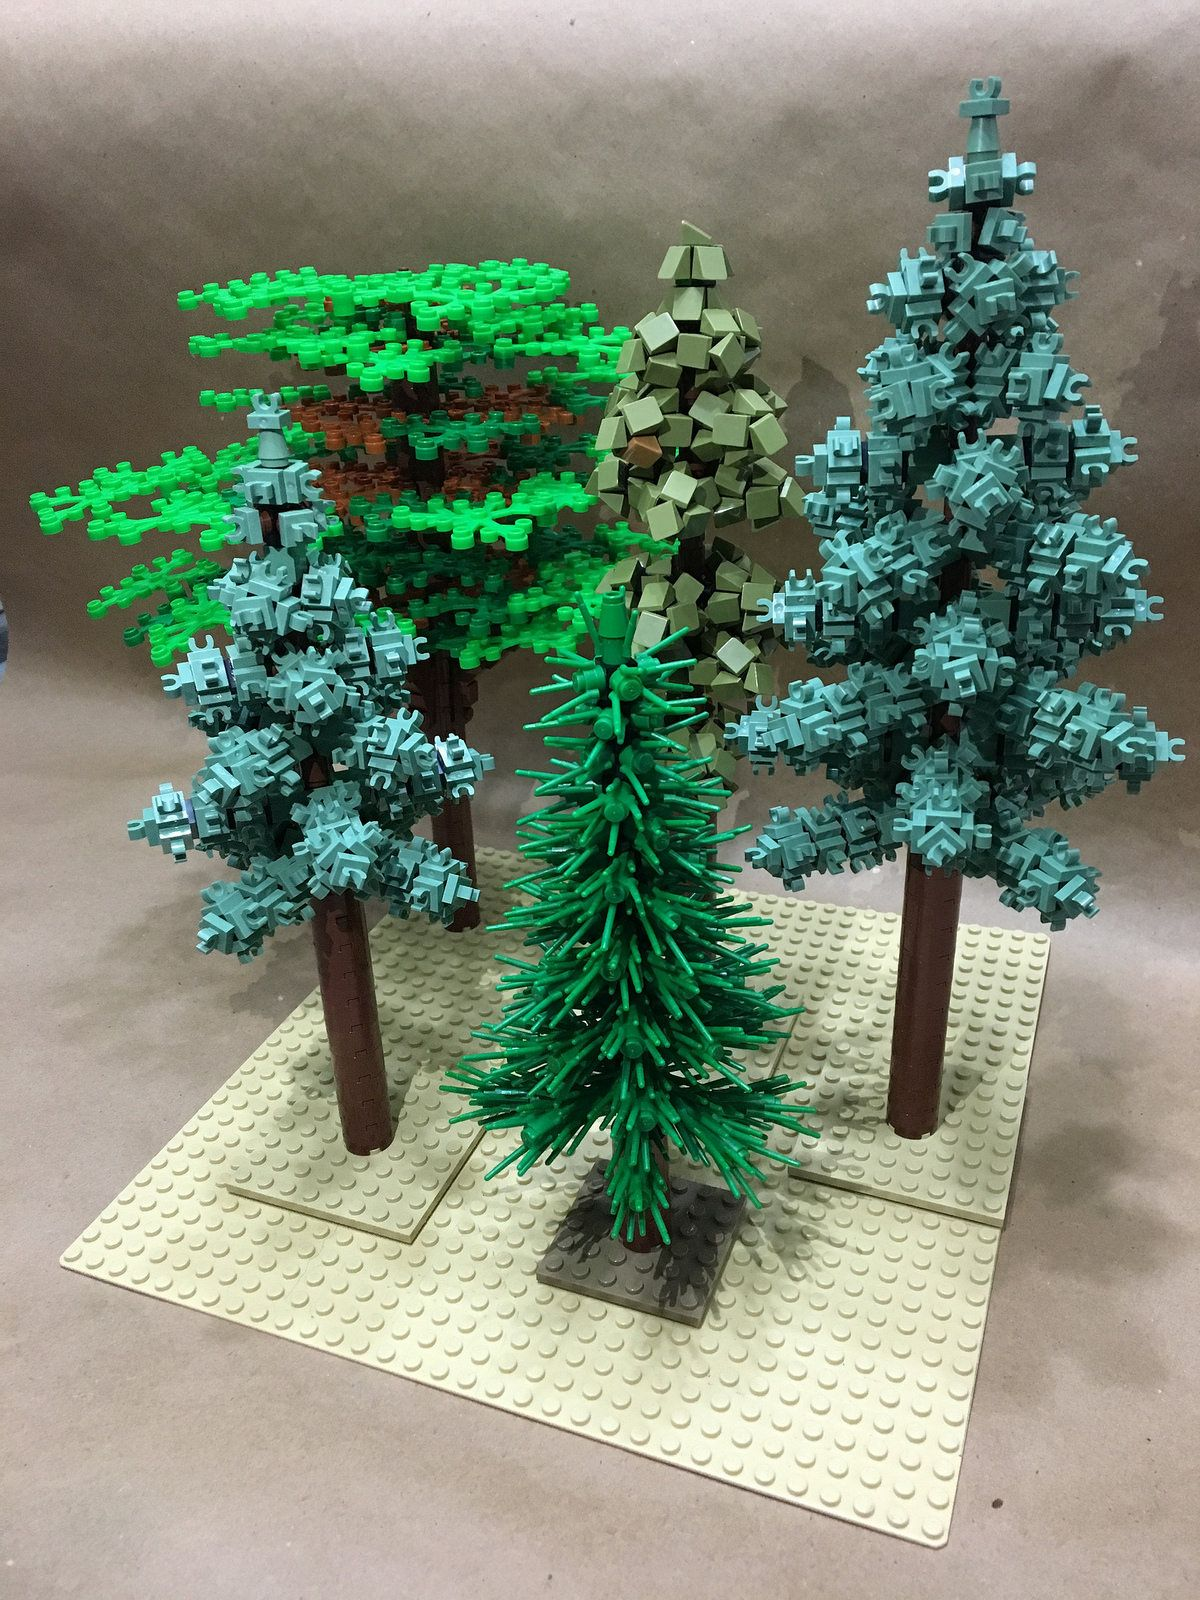 Cherry Blossoms Ii Lego Design Lego Craft Lego Creative